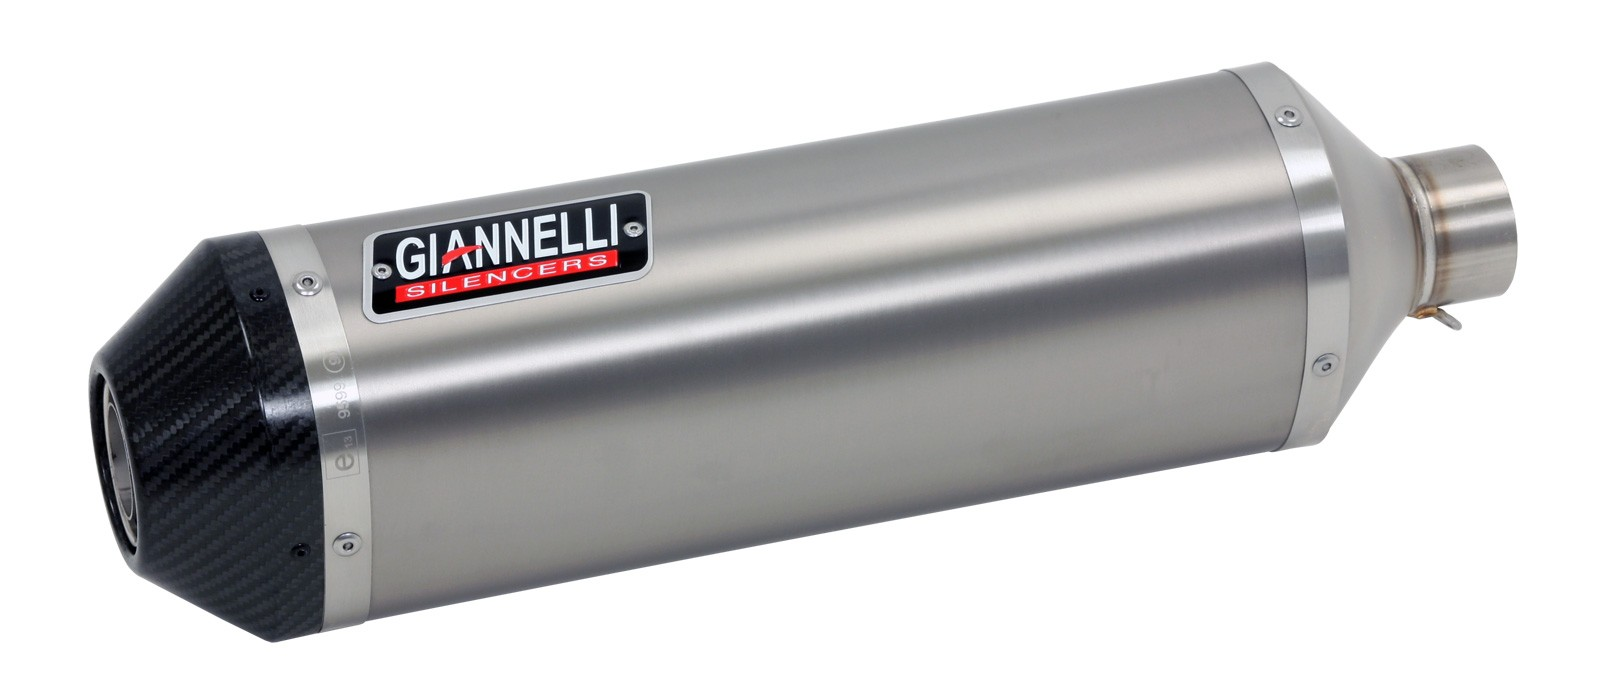 ESCAPES GIANNELLI HONDA - Sistema completo IPERSPORT Silenciador aluminio versión Black Line Honda CBR 125 R Giannelli